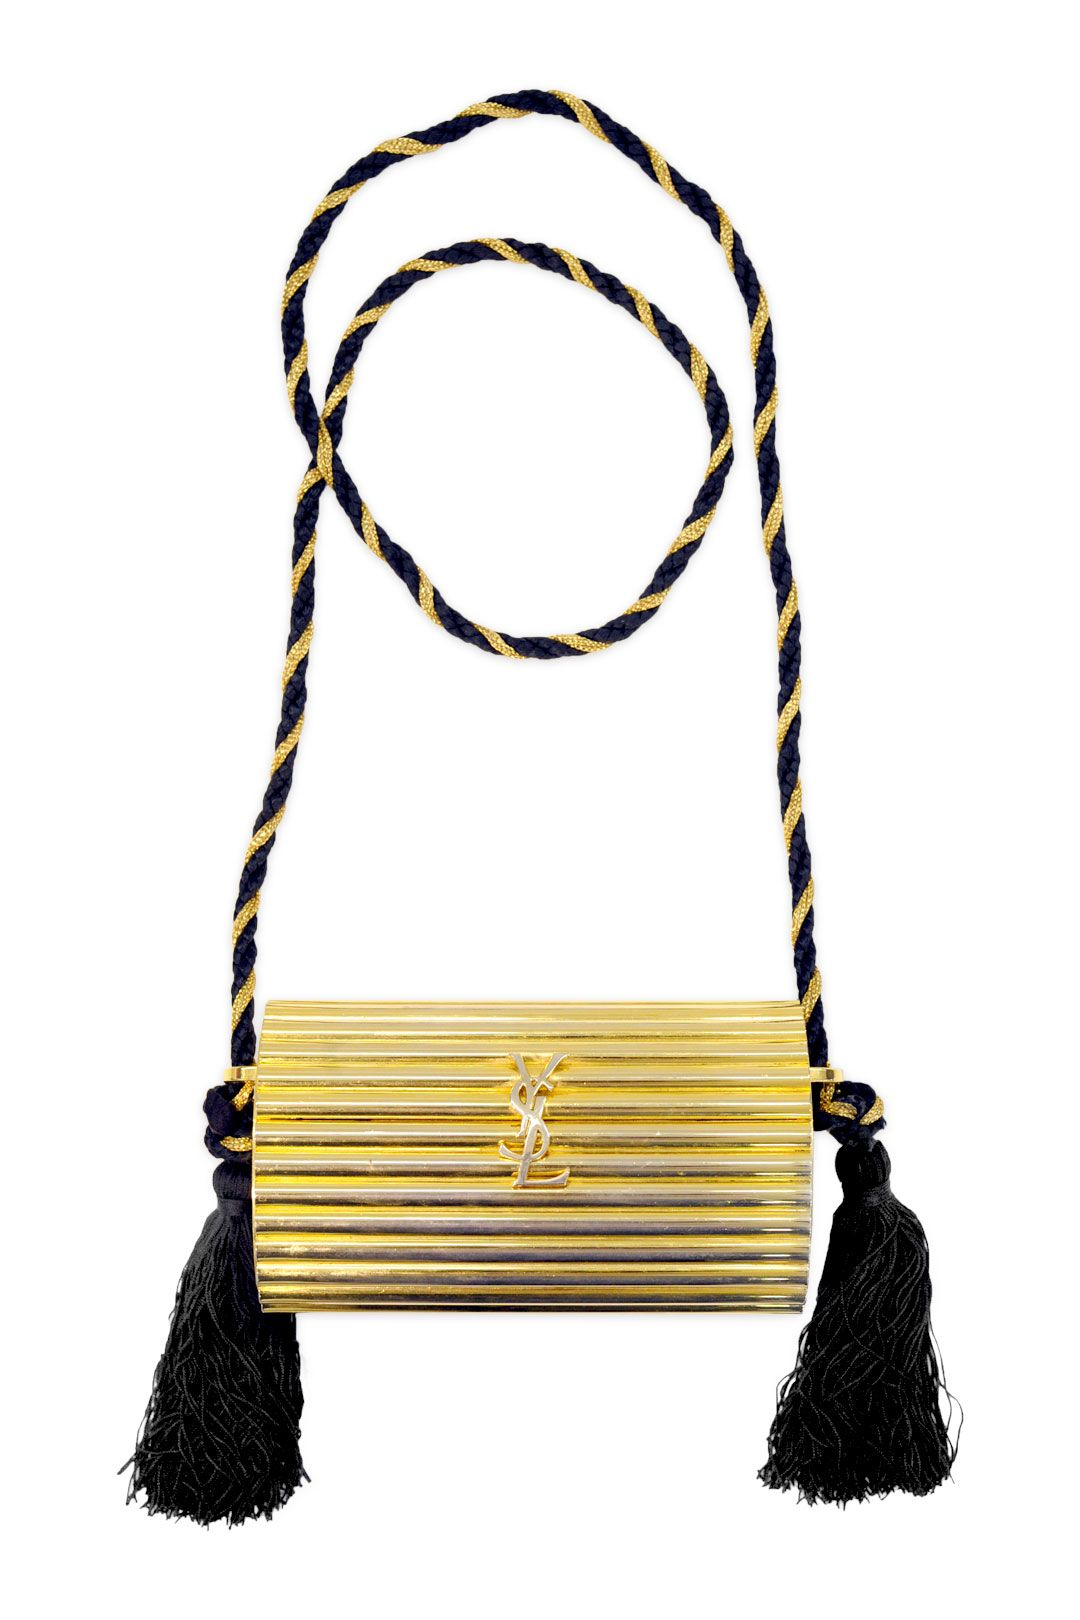 Decades Vintage Vintage Ysl Gold Tassel Clutch Vintage Ysl Tassel Clutch Ysl Clutch